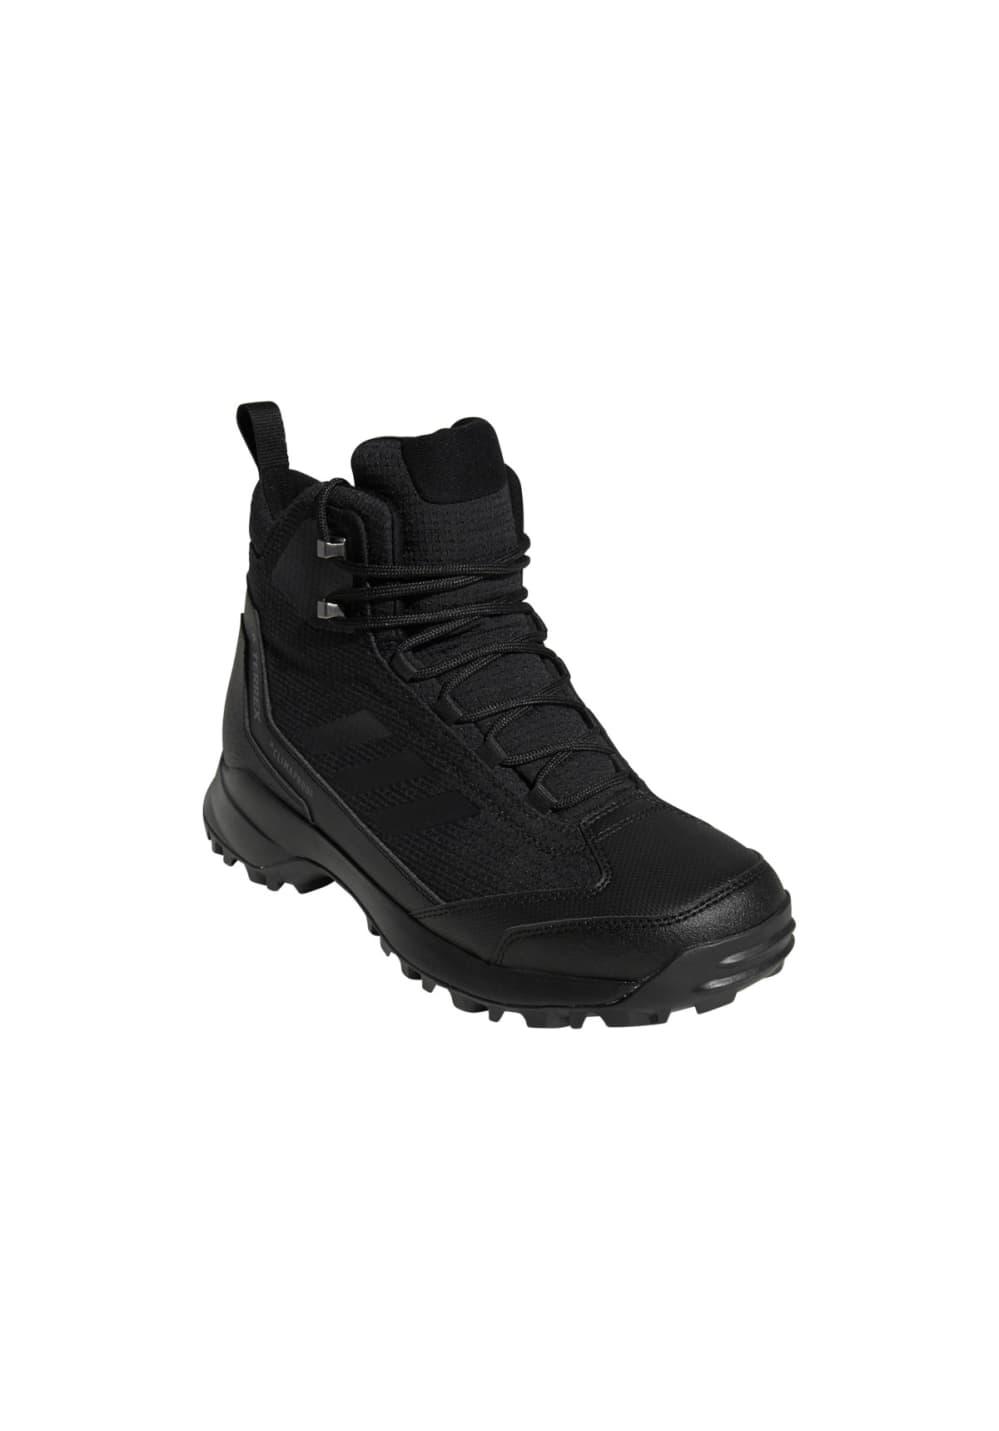 70a1a26efd5 adidas TERREX TERREX HERON MID CW CP - Outdoor shoes for Men - Black